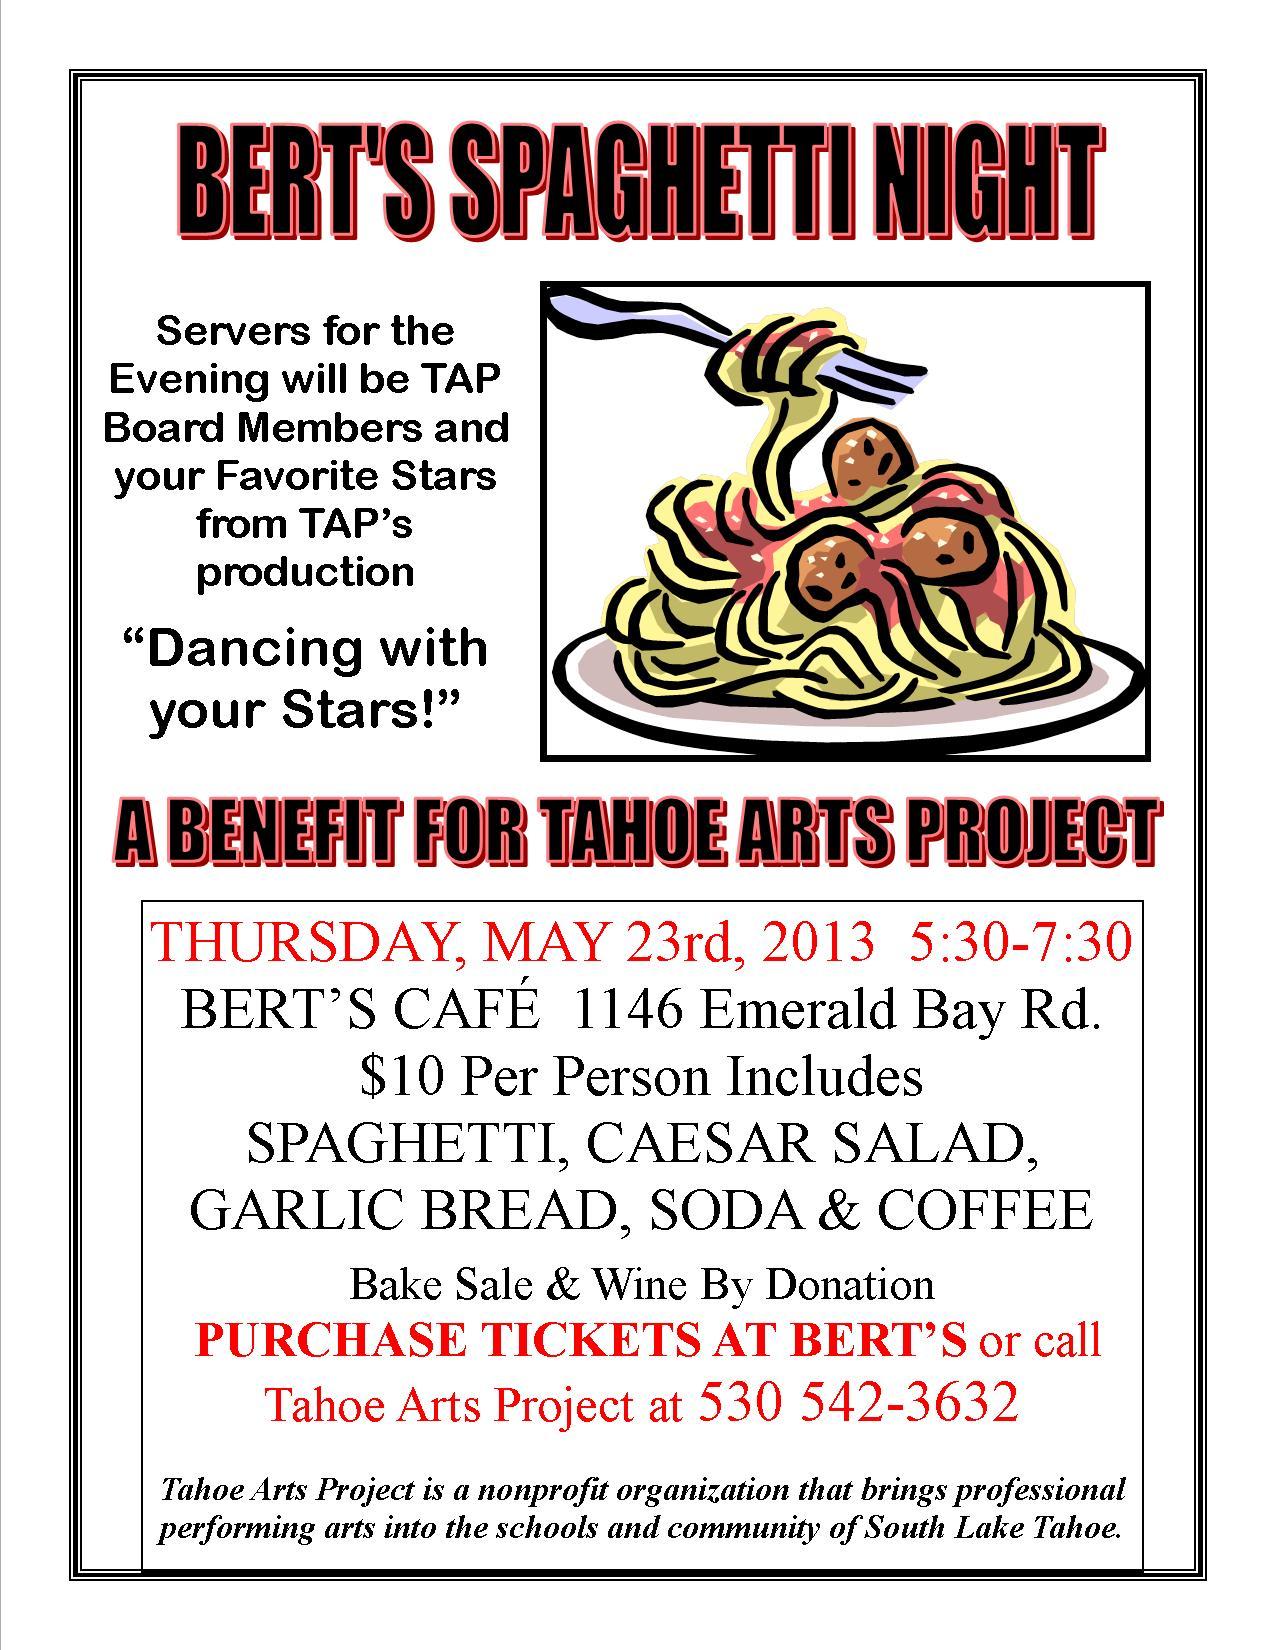 Spaghetti dinner fundraiser clipart